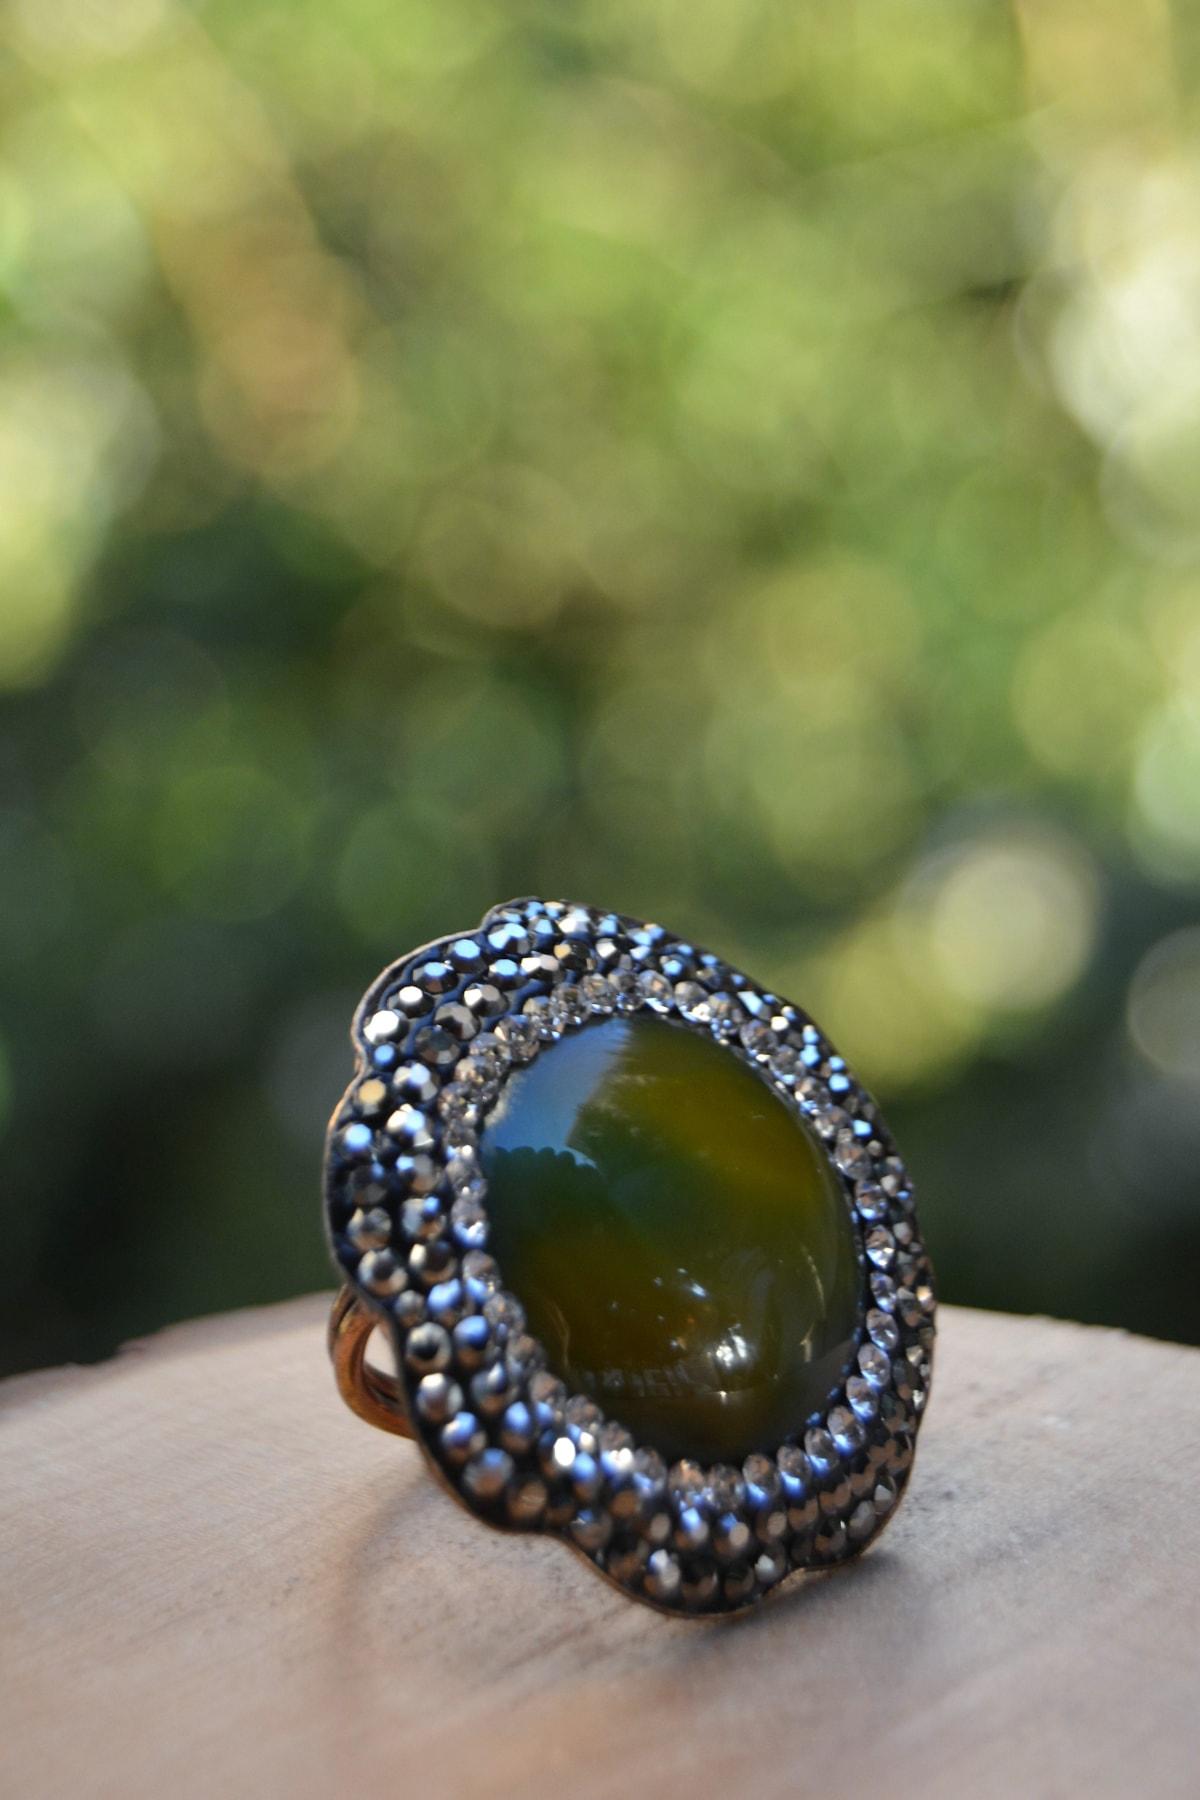 Stoneage Yeşil Akik Doğal Taş Ayarlanabilir Kadın Yüzük 2